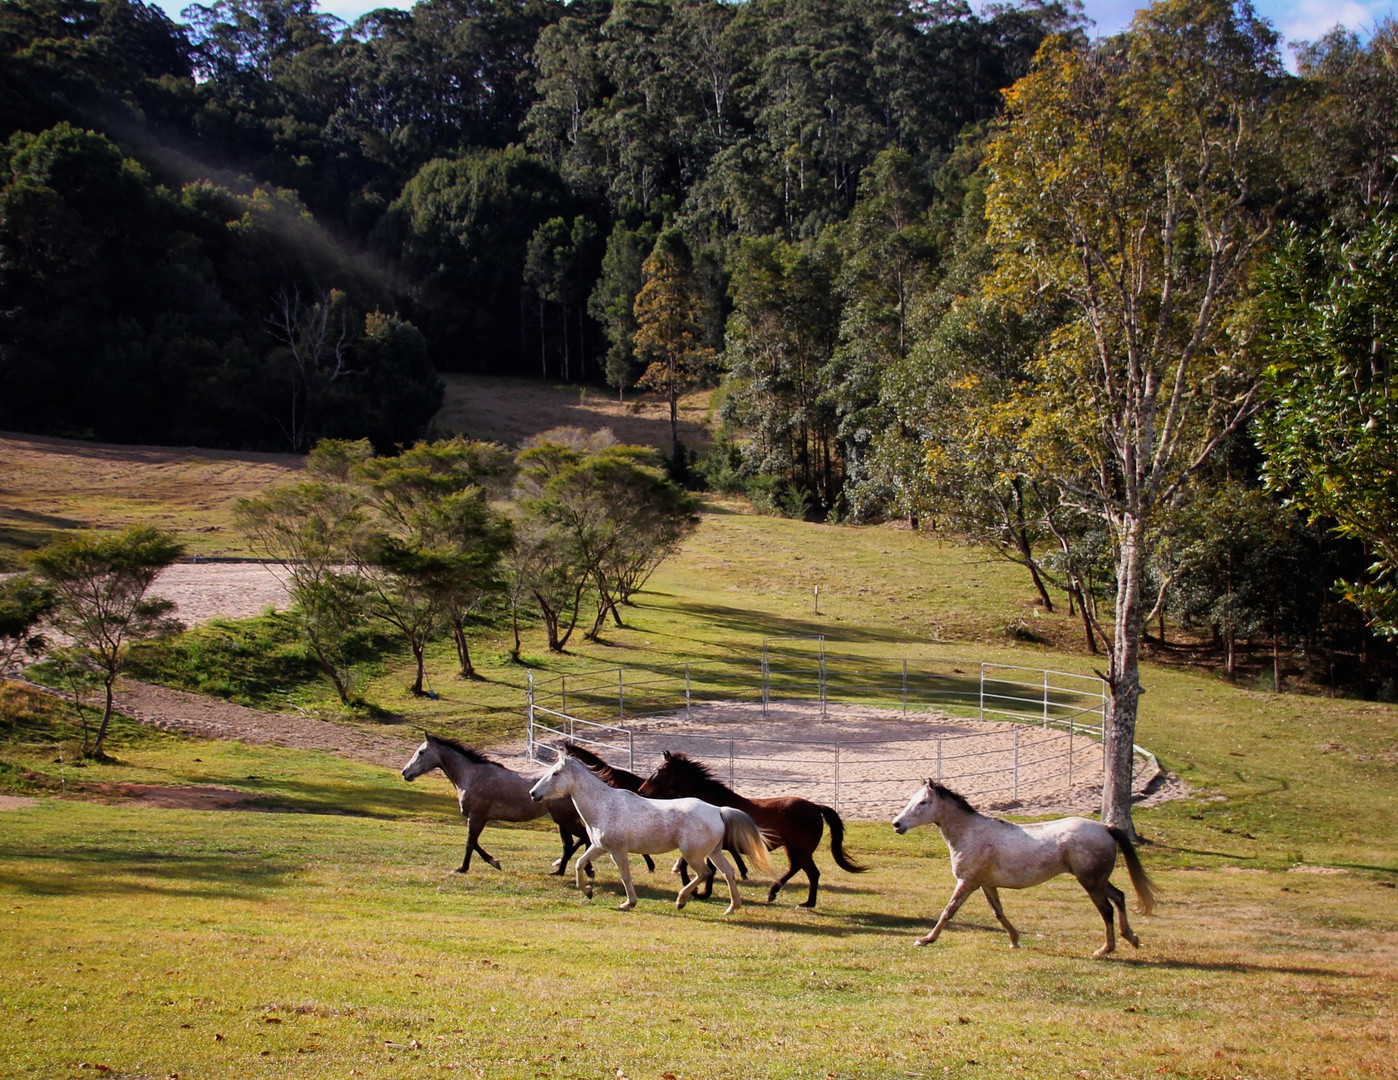 horses in action.jpg